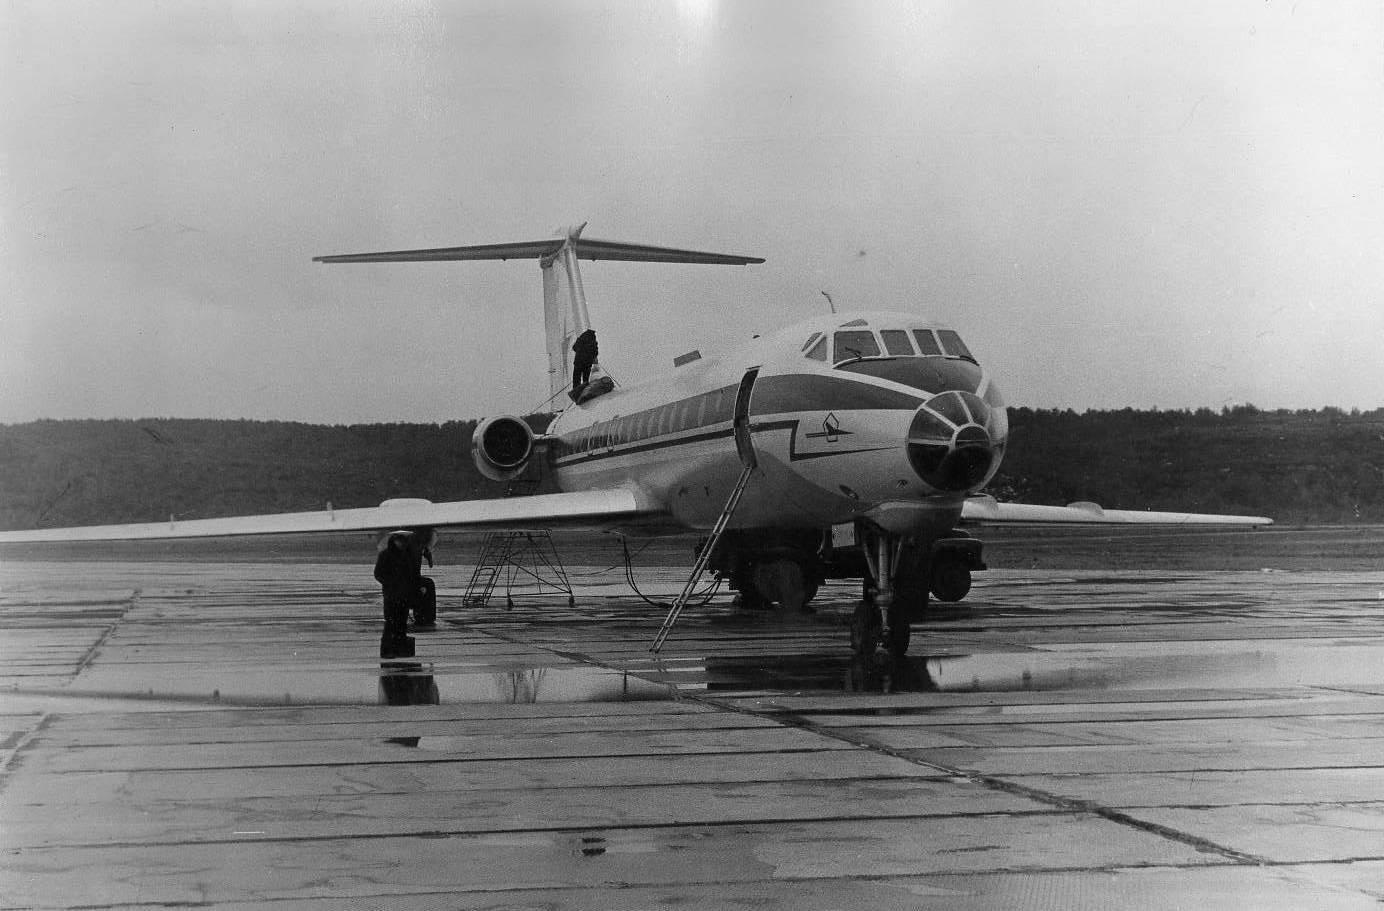 Туполев ту-134 — обзор самолета, схема салона